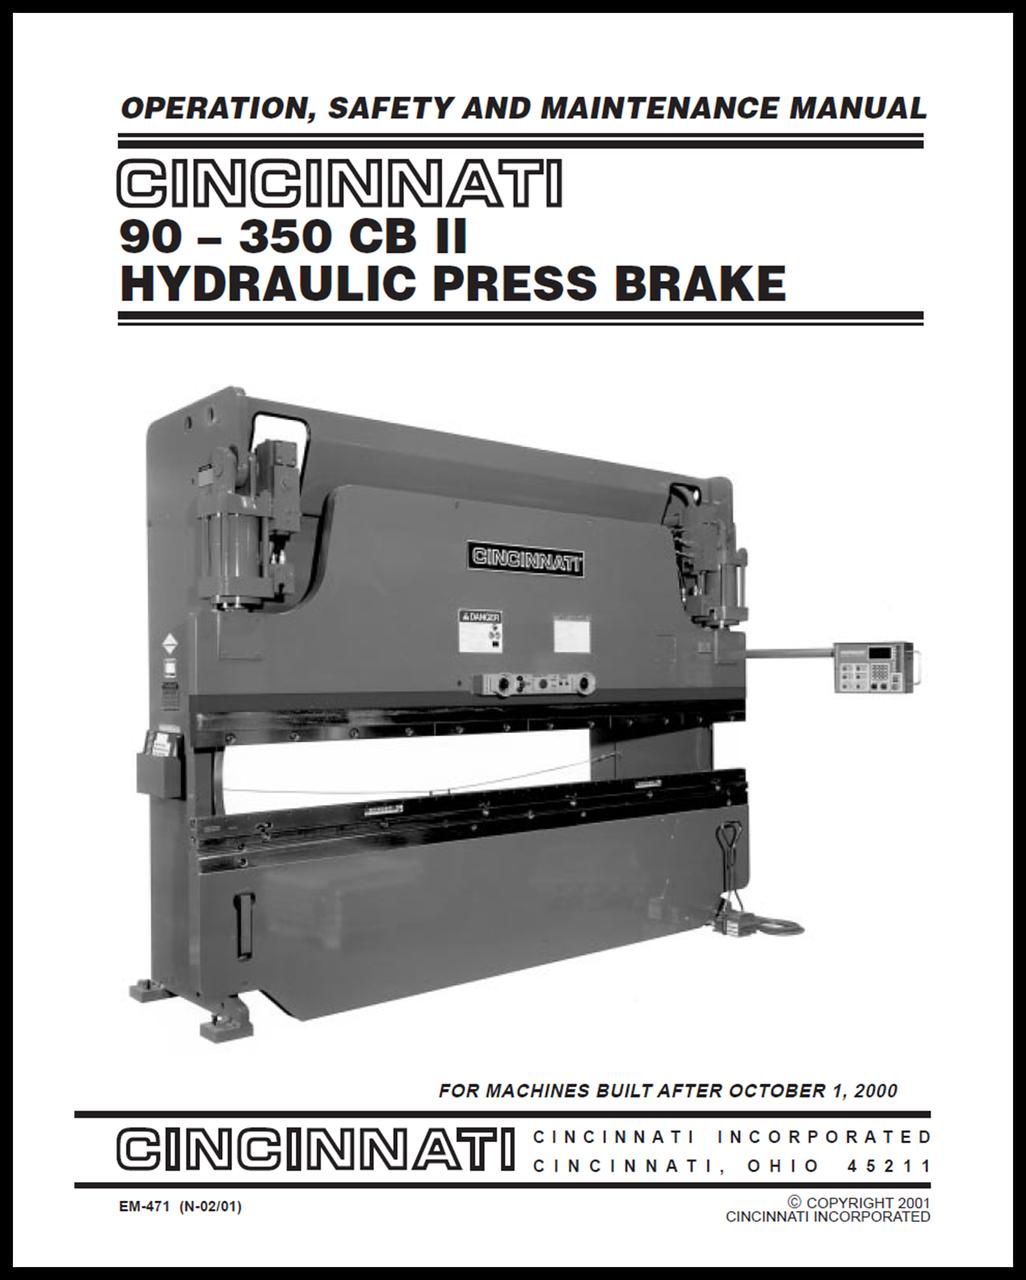 cb ii cnc press brake manual bundle cincinnati incorporated rh ci online e ci com Press Brake Parts List Cincinnati MaxForm Press Brake